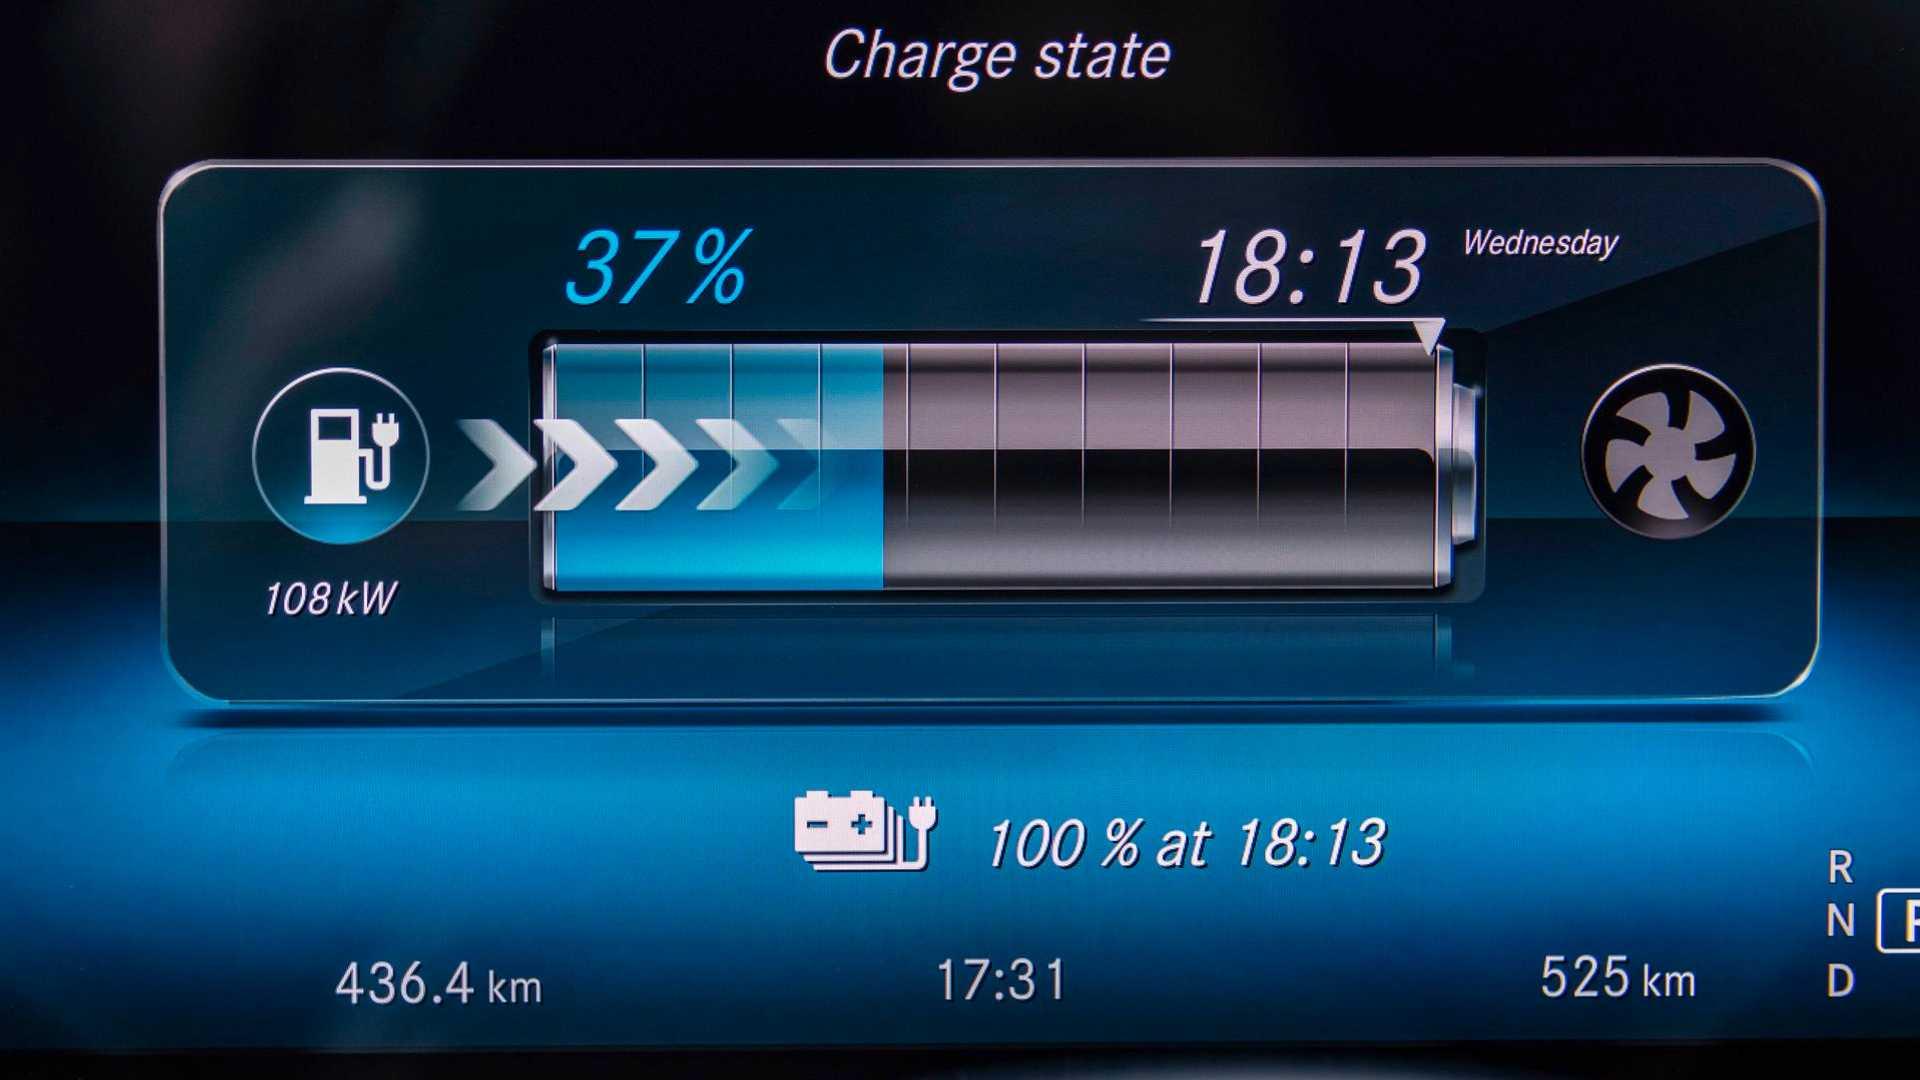 Mercedes Benz Eqc Charge Display